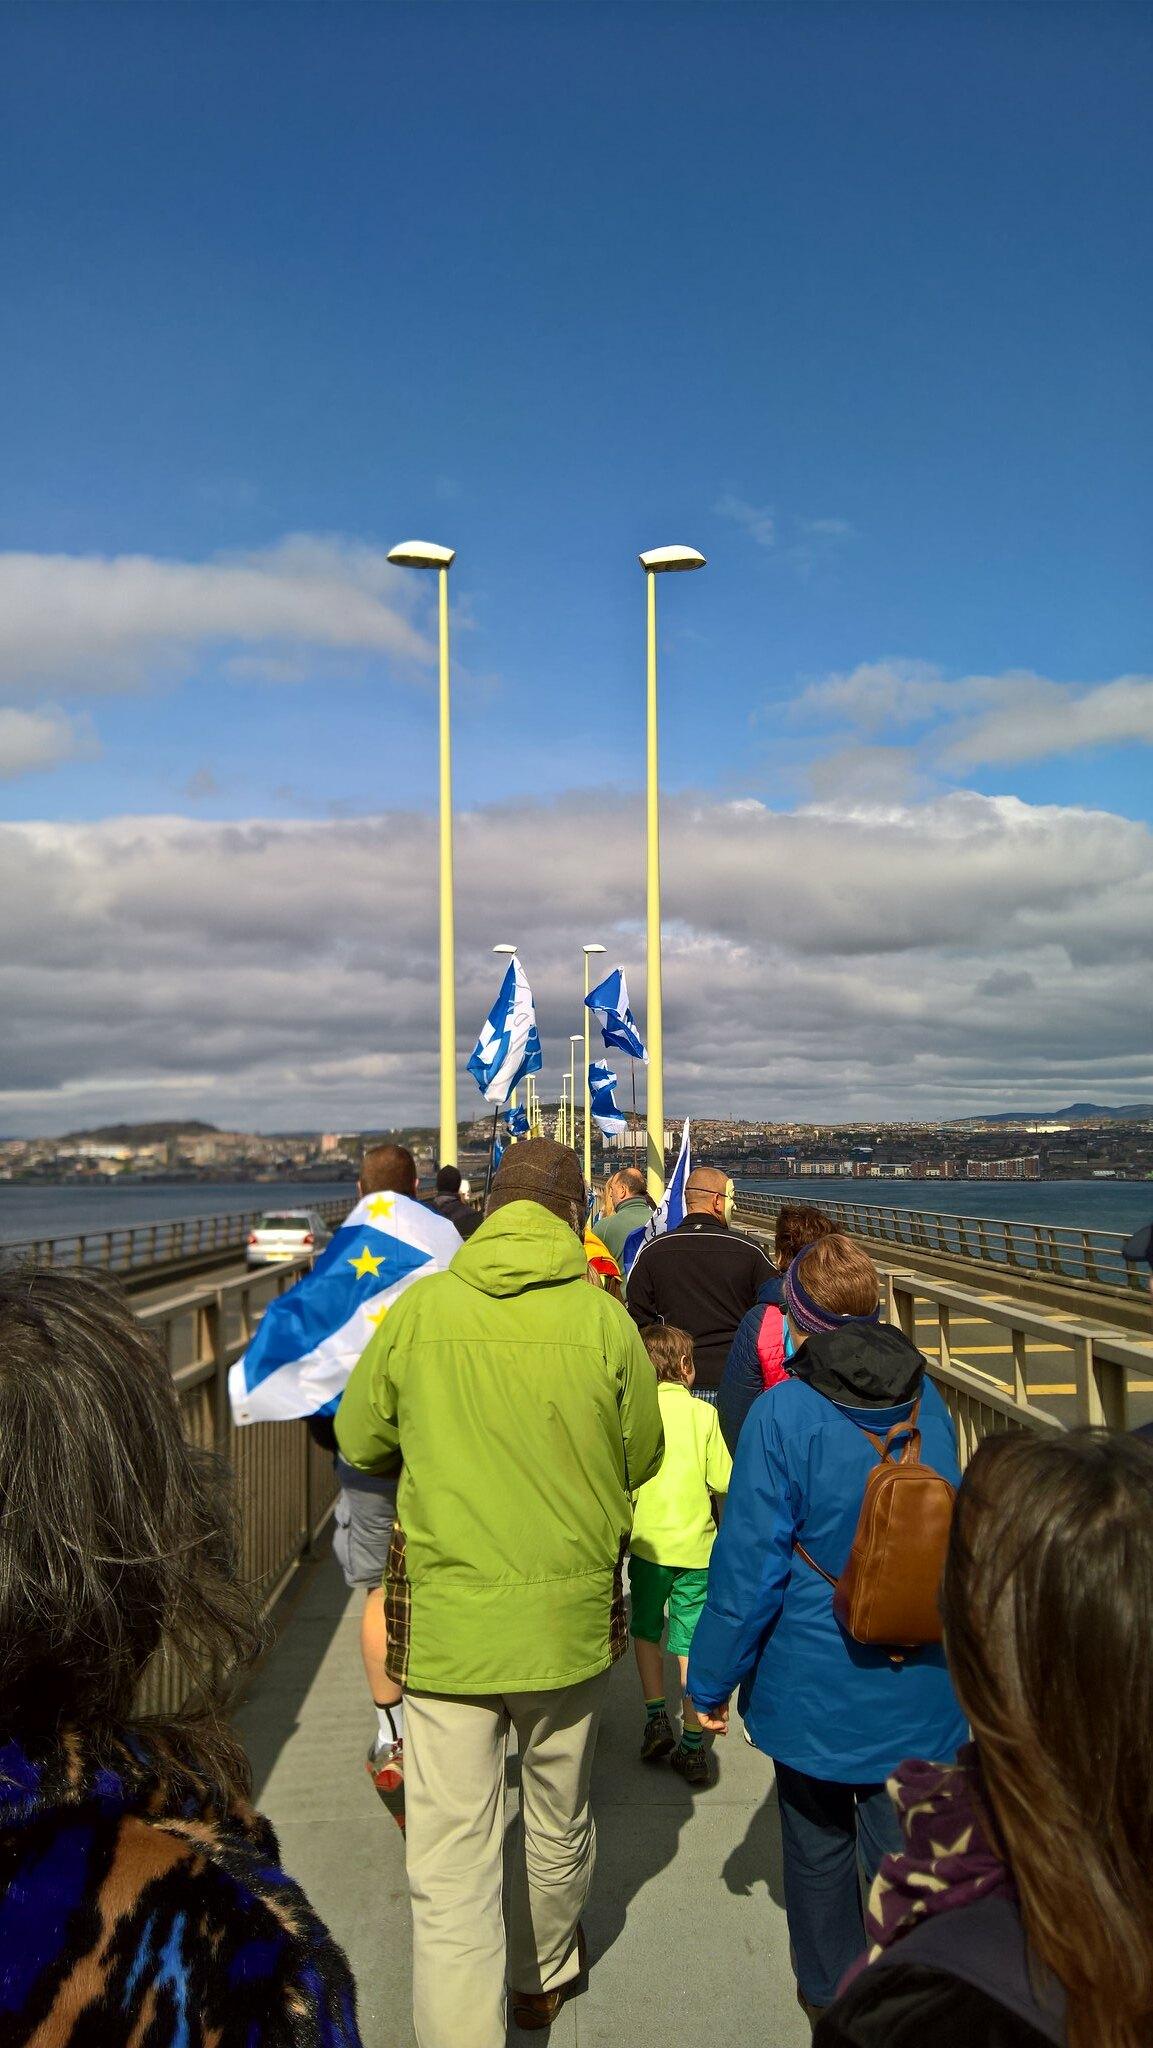 People marching across the Tay Bridge